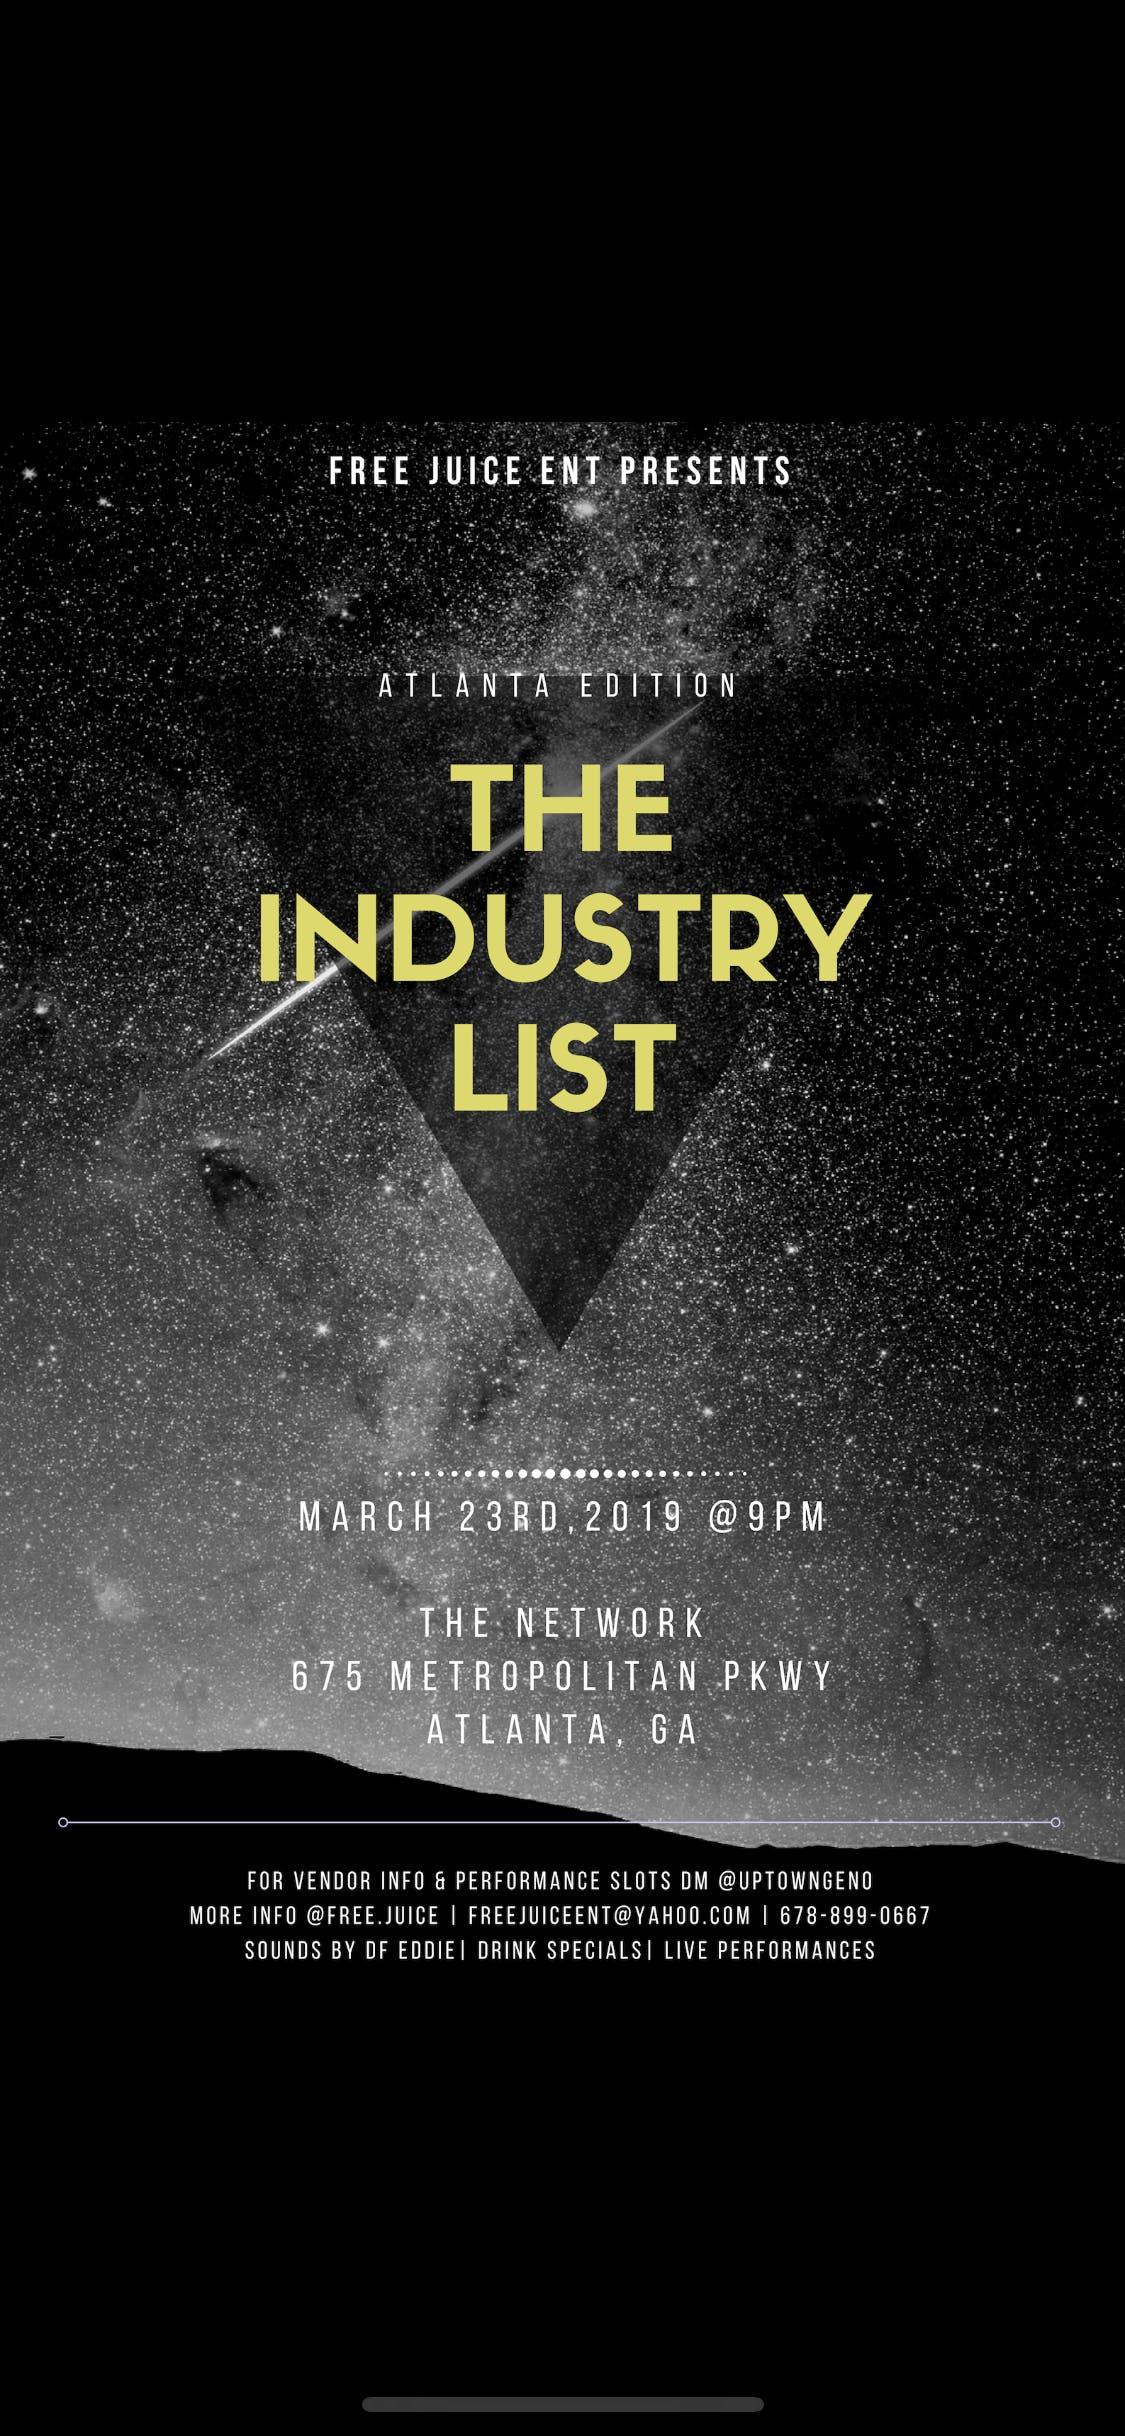 The Industry List- Concert of ATLANTA's Trend